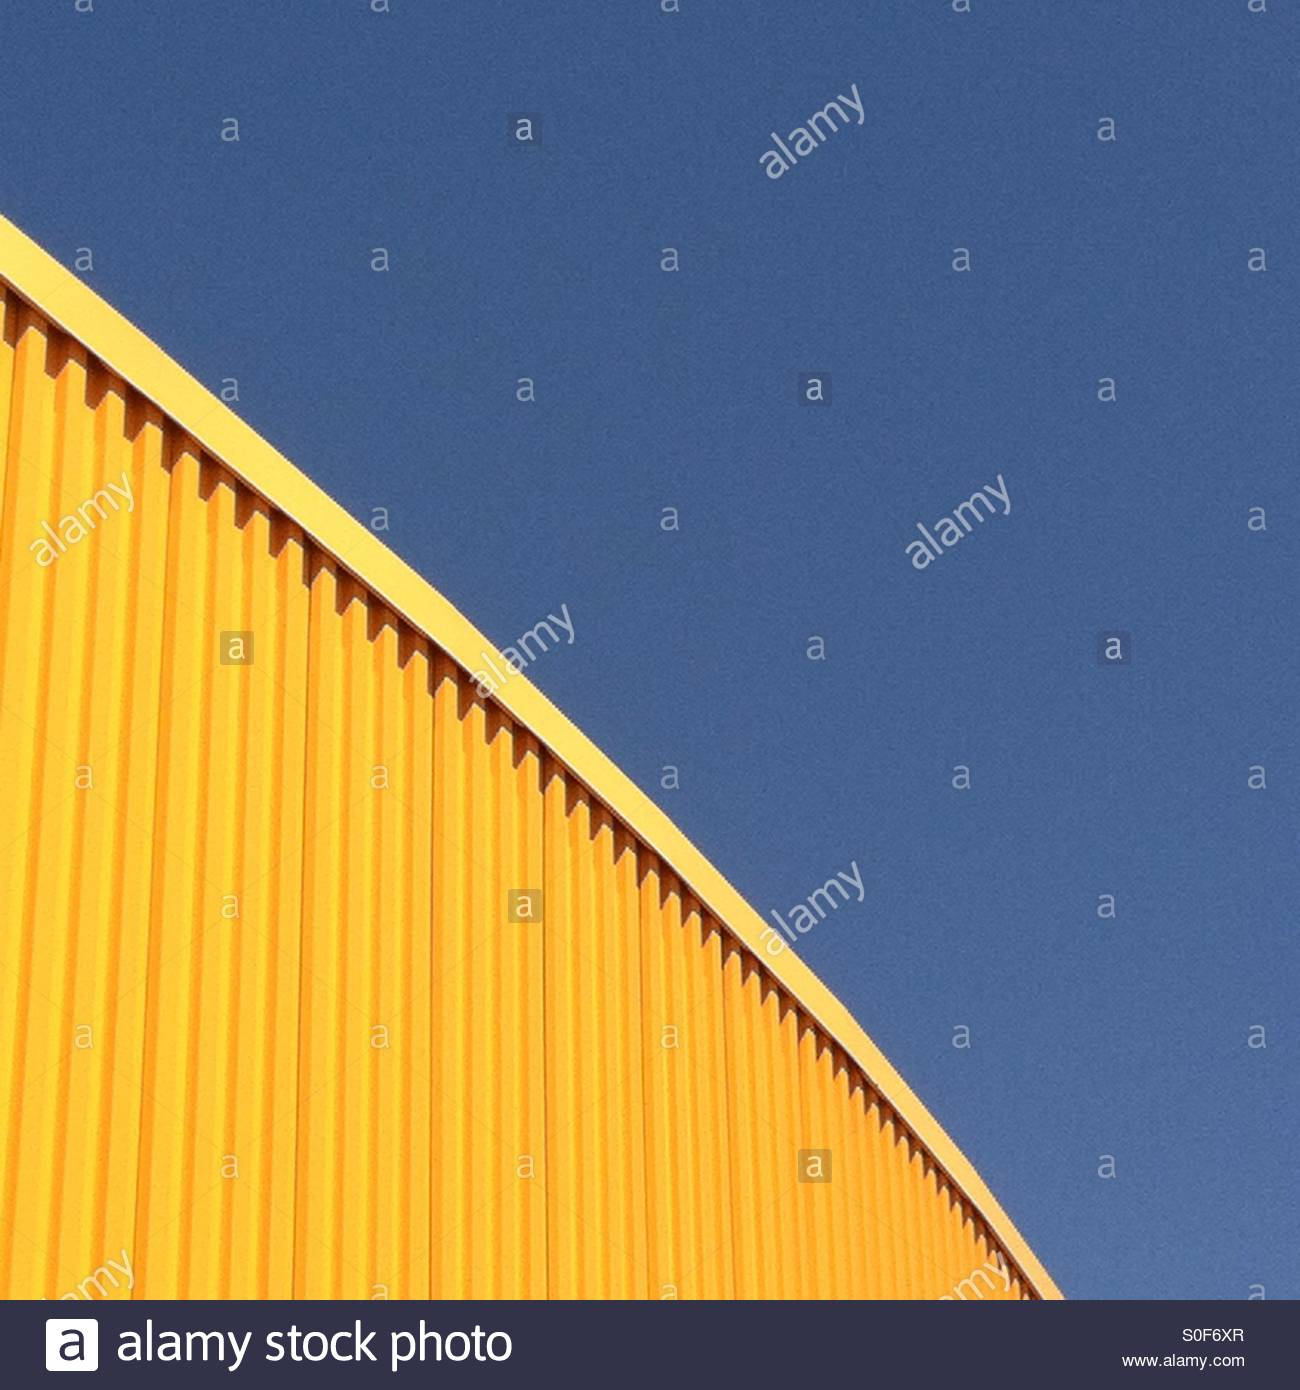 Blue - Yellow - Stock Image